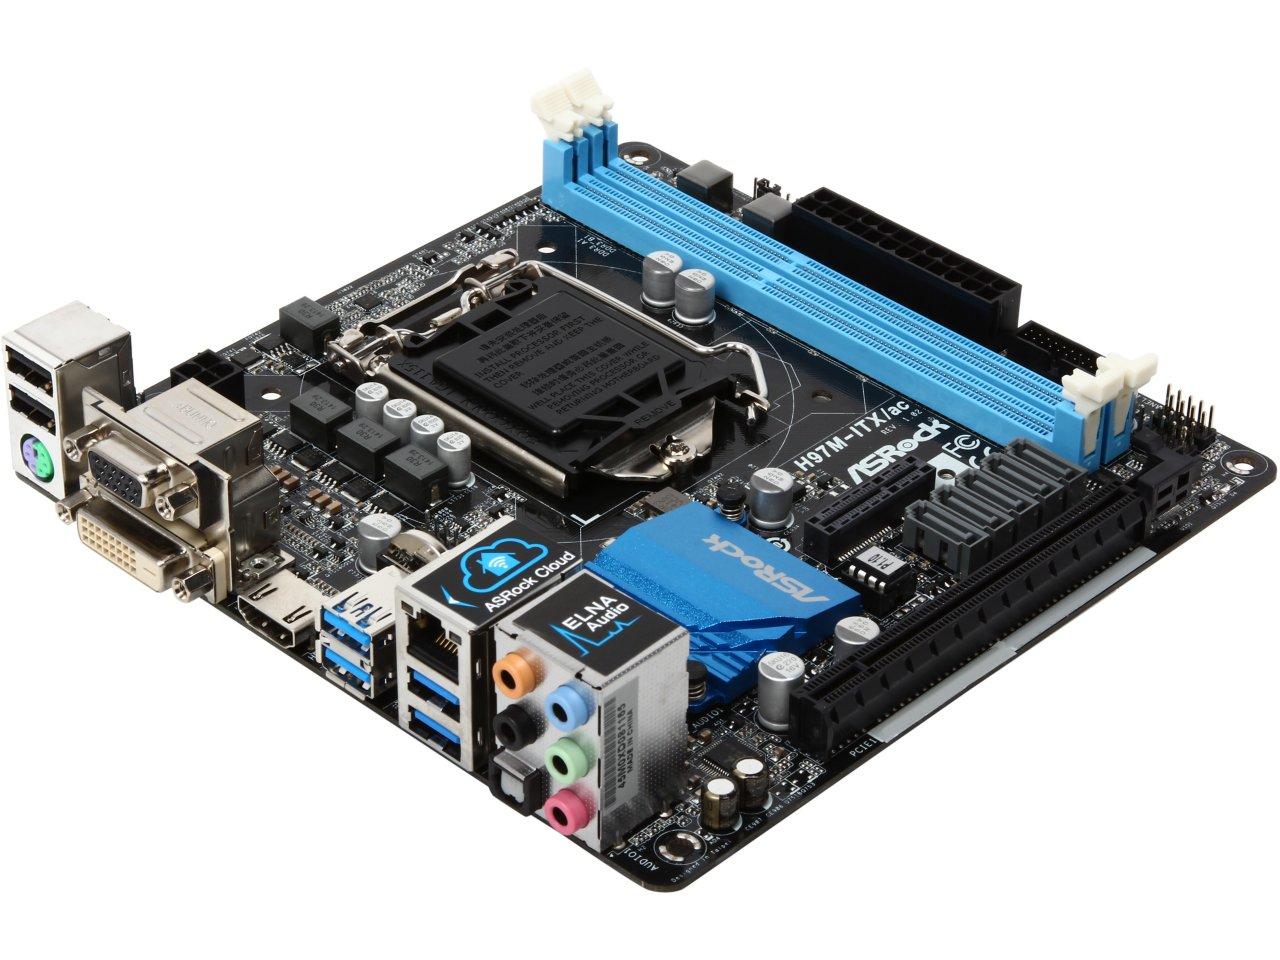 ASRock H97M-ITX/ac LGA 1150 H97 Mini ITX Intel Motherboard for $55.99 AR, MSI Z170A SLI LGA 1151 Z170 ATX Intel Motherboard for $87.99 AR + S&H & More @ Newegg.com